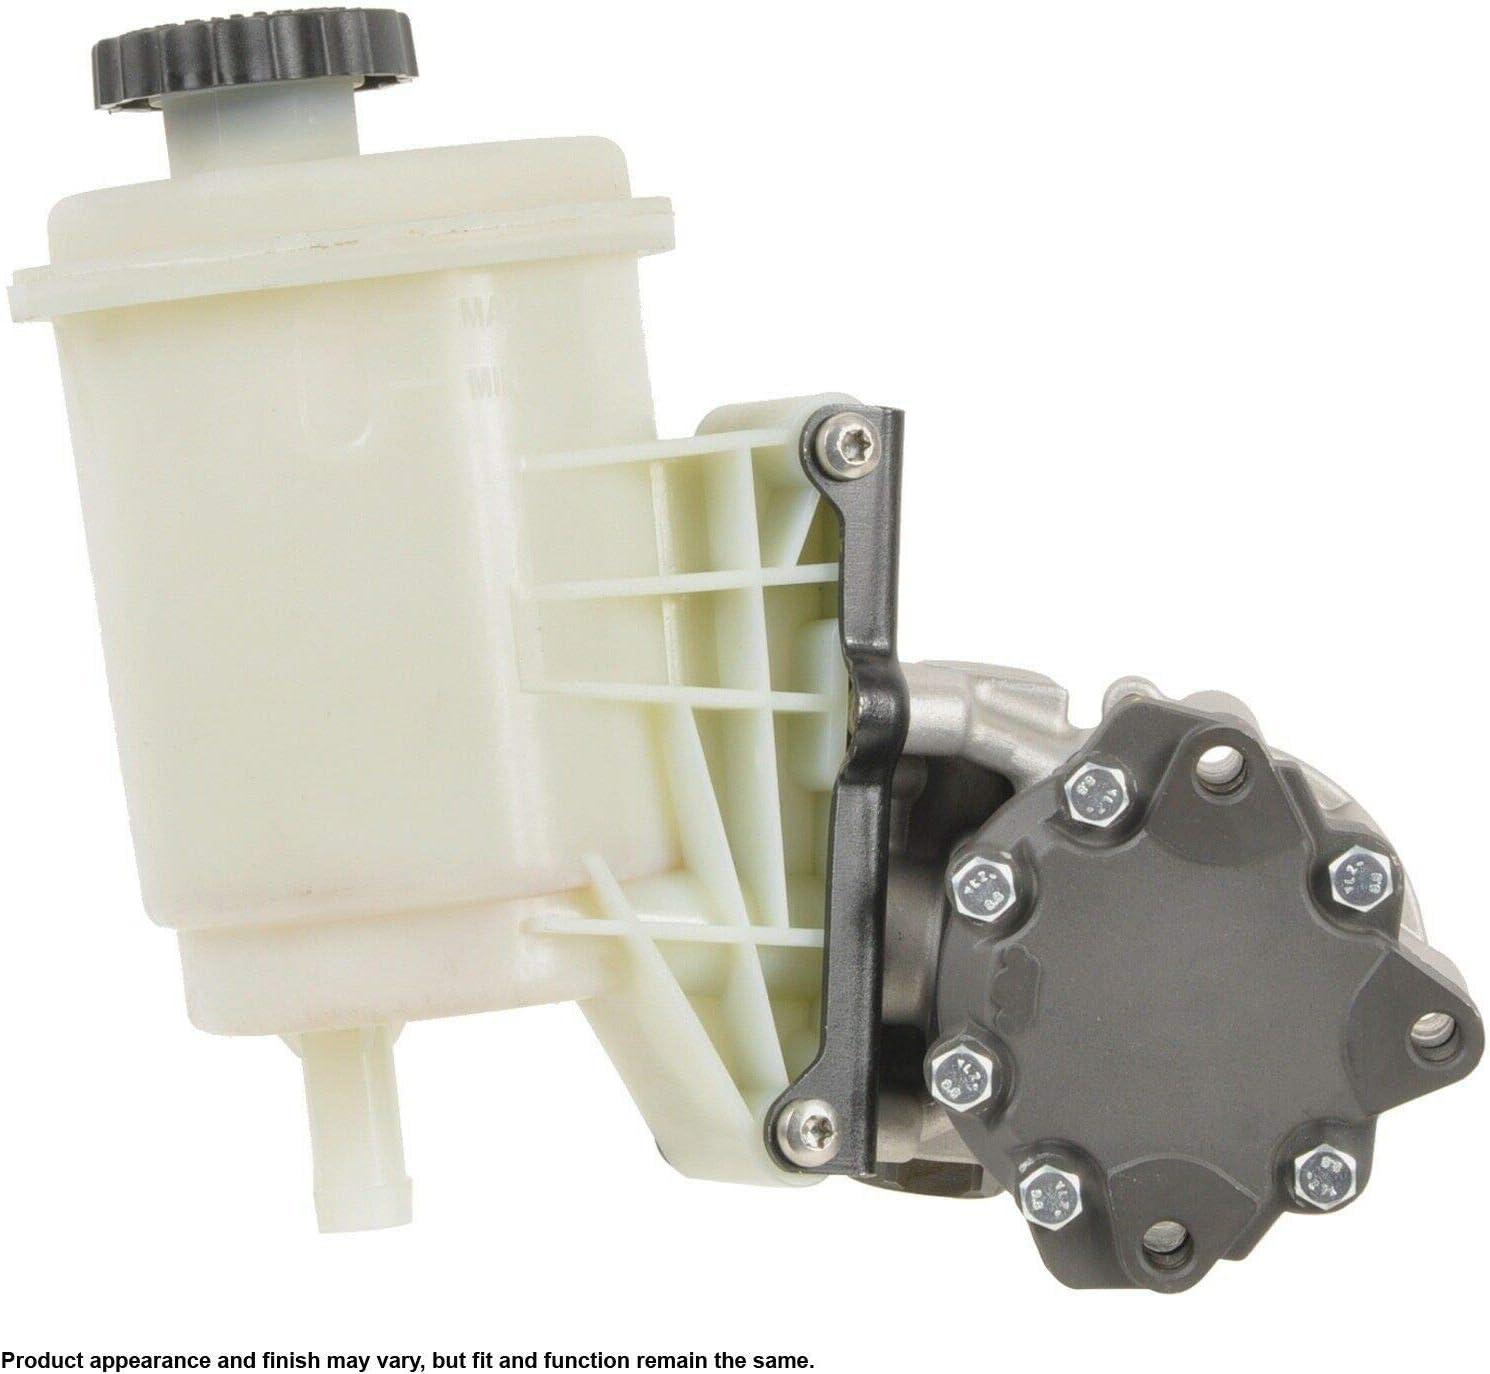 Cardone Select Cardone 96-1008R New Power Steering Pumps W/Reservoir, 1 Pack